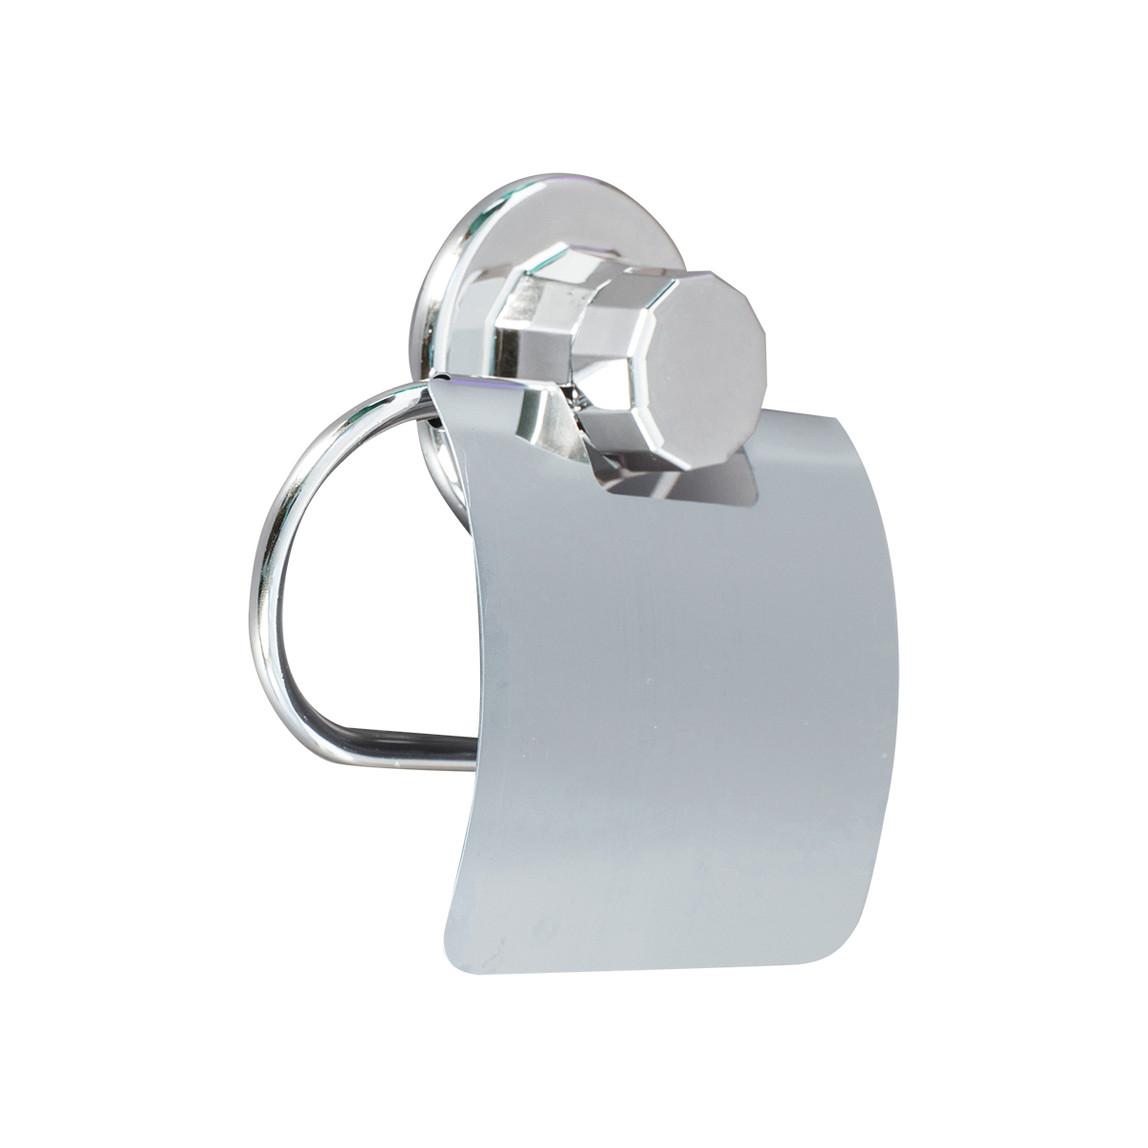 Teknotel Vakumlu Kapaklı Tuvalet Kağıtlığı